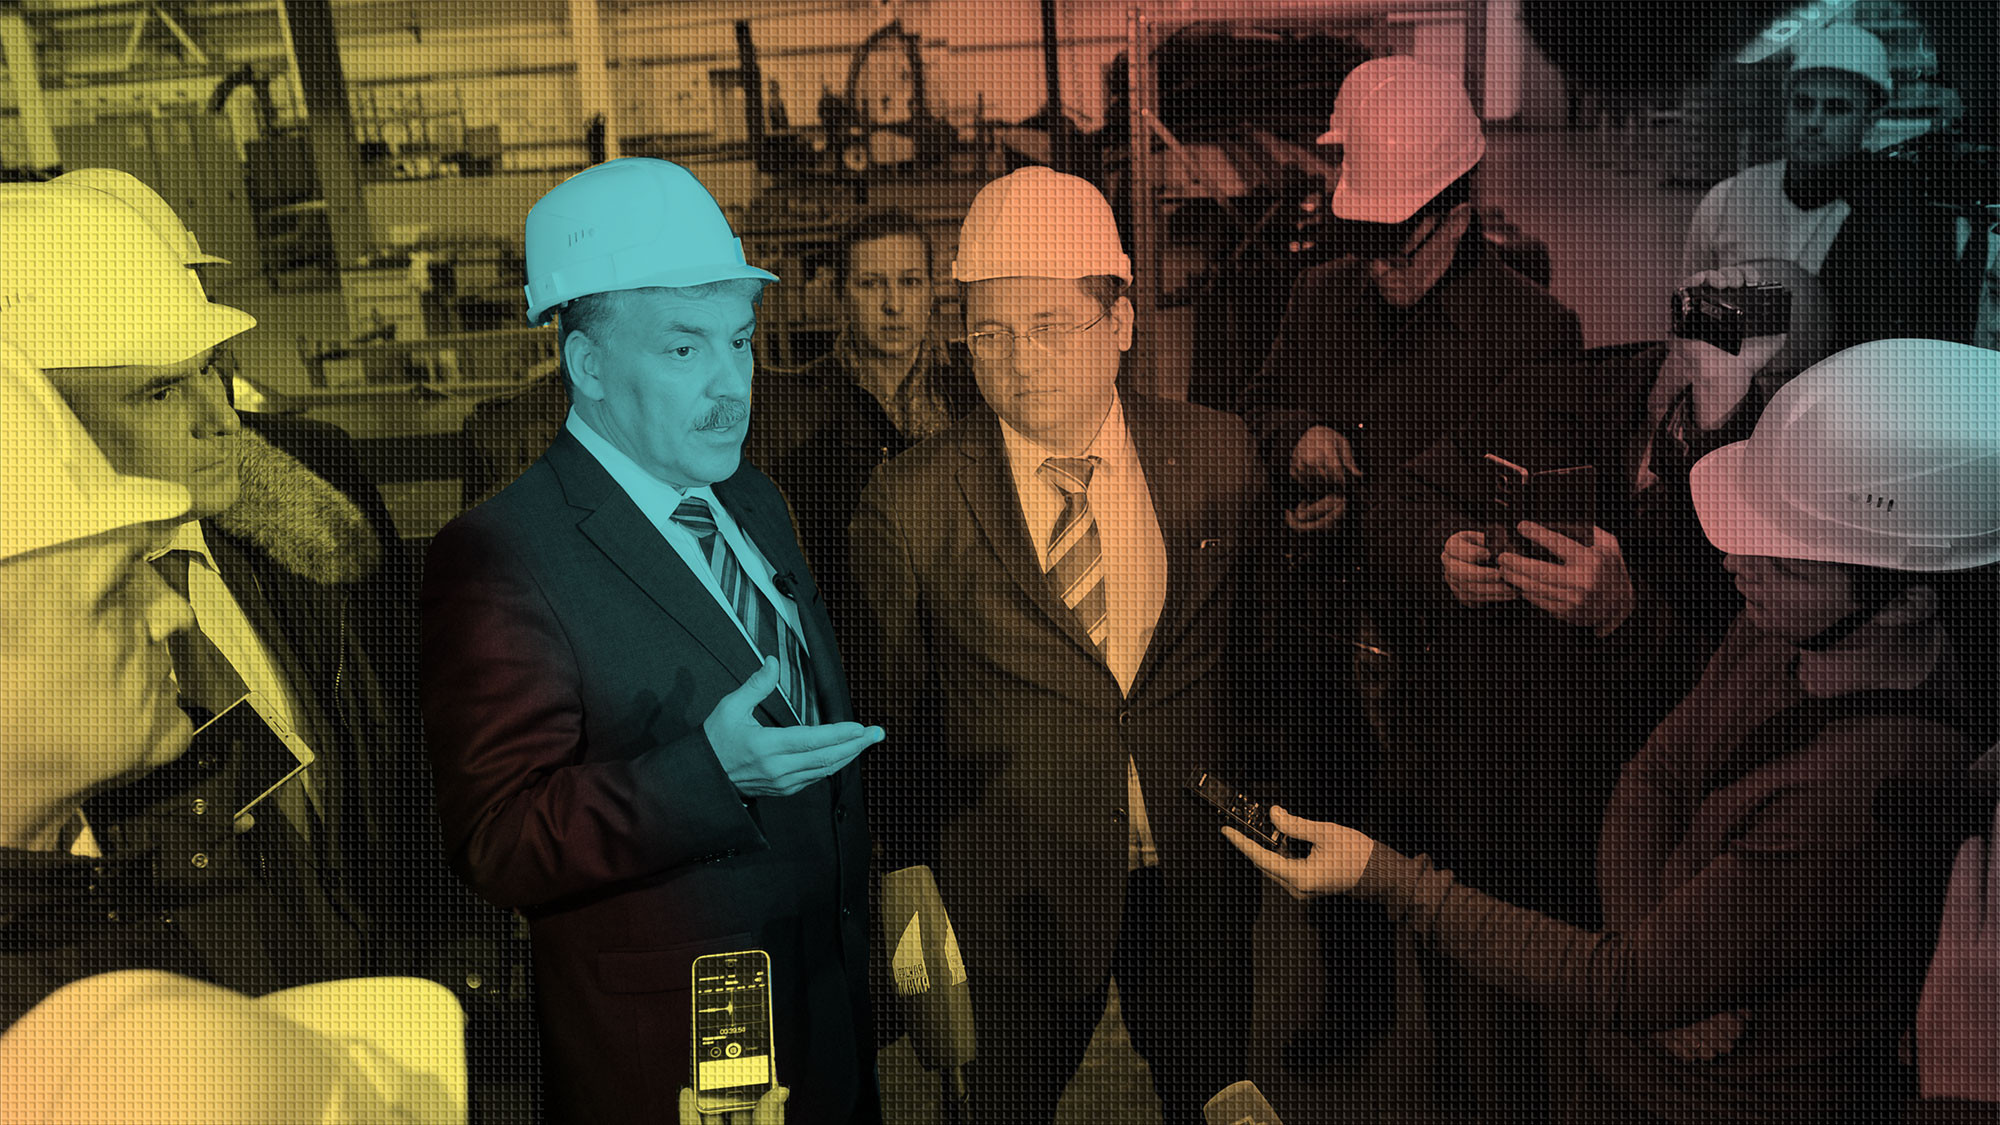 <p>Коллаж &copy; L!FE &nbsp;Фото: &copy; РИА Новости /&nbsp;Сергей Пивоваров</p>